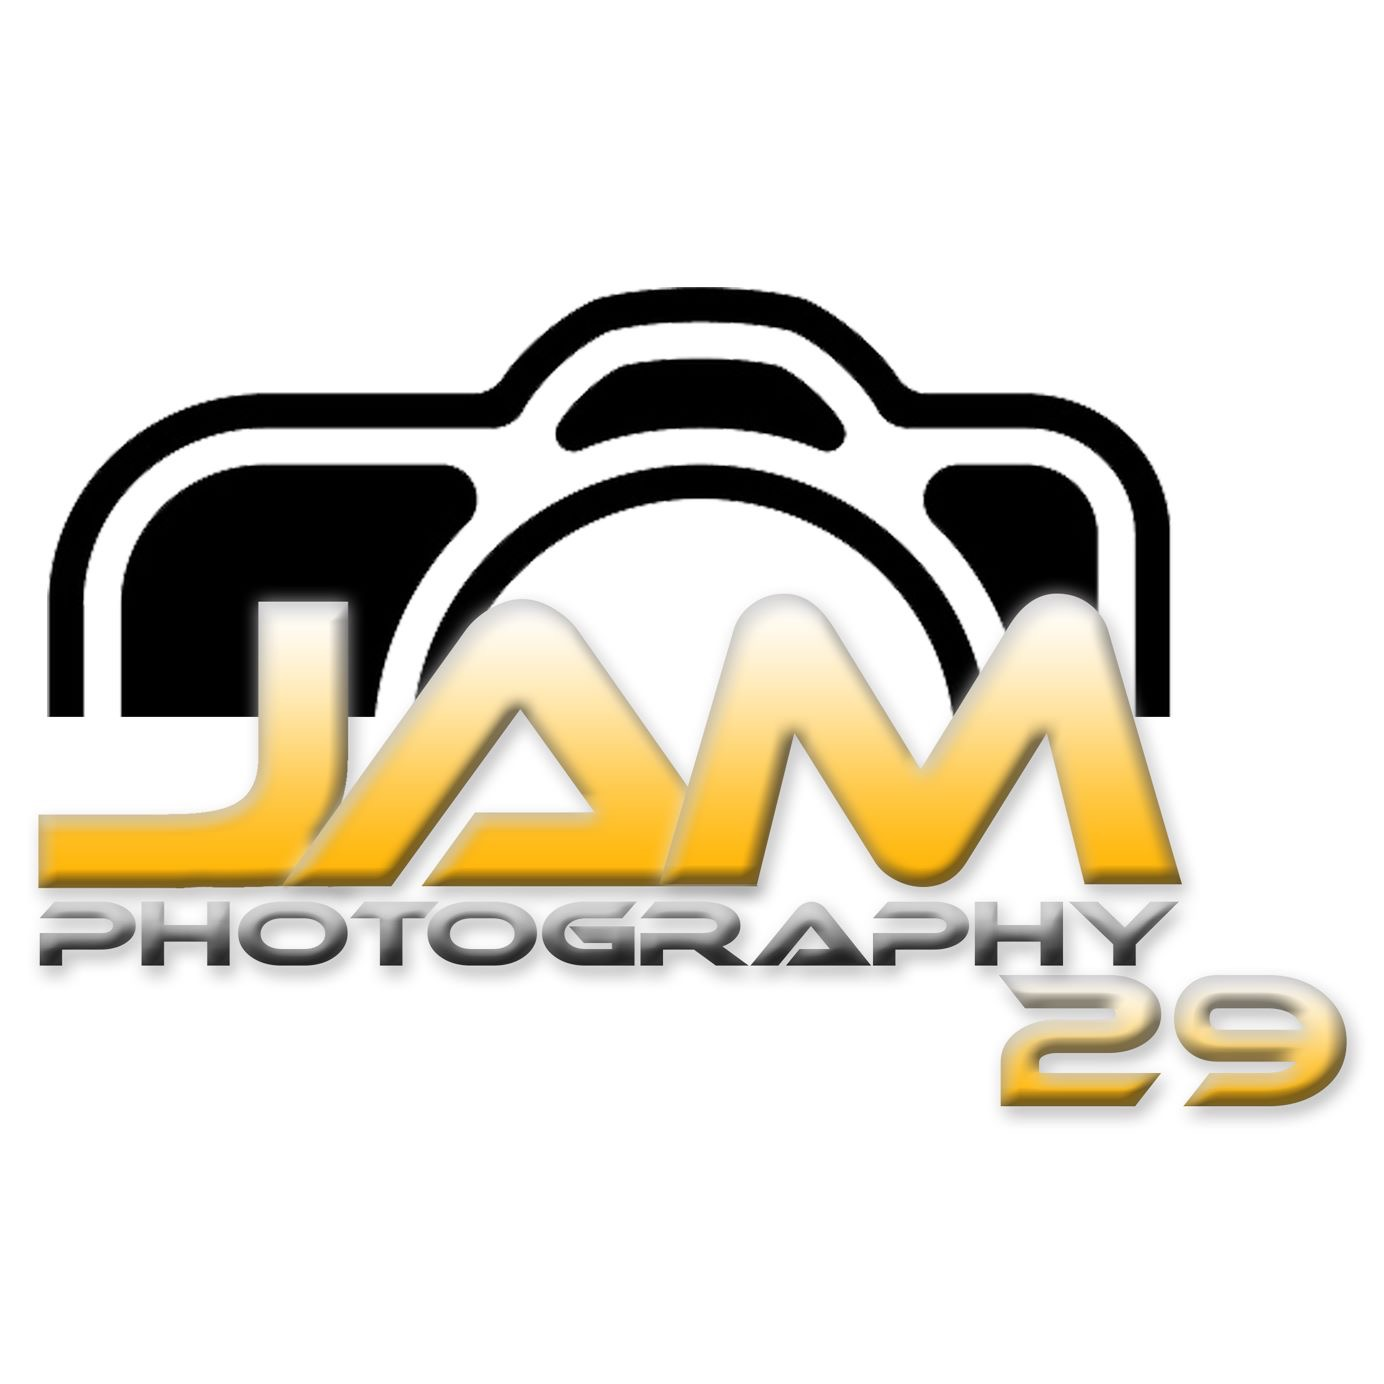 J.A.M. Photography29